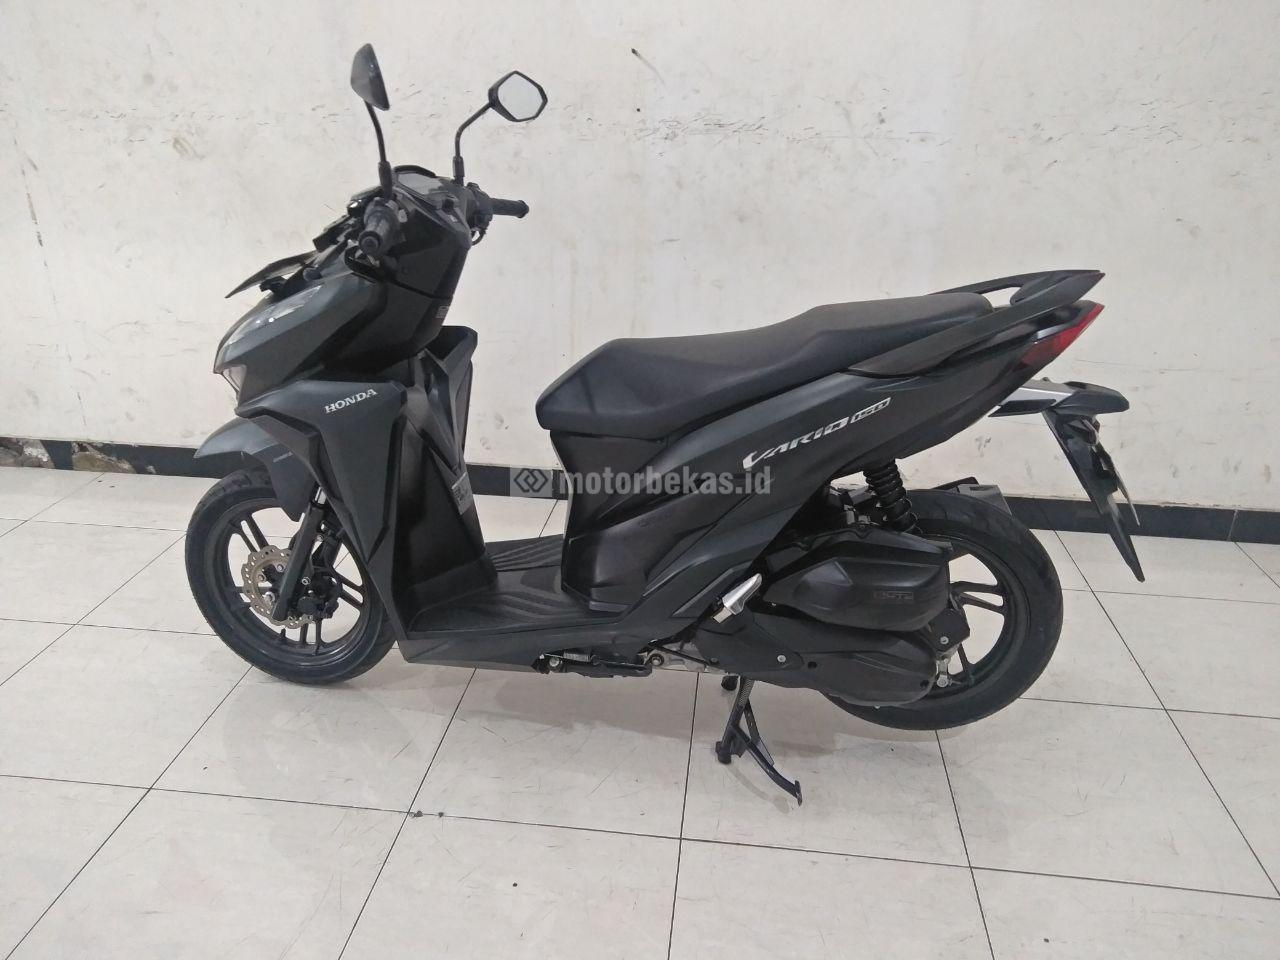 HONDA VARIO 150 SPORTY  3453 motorbekas.id